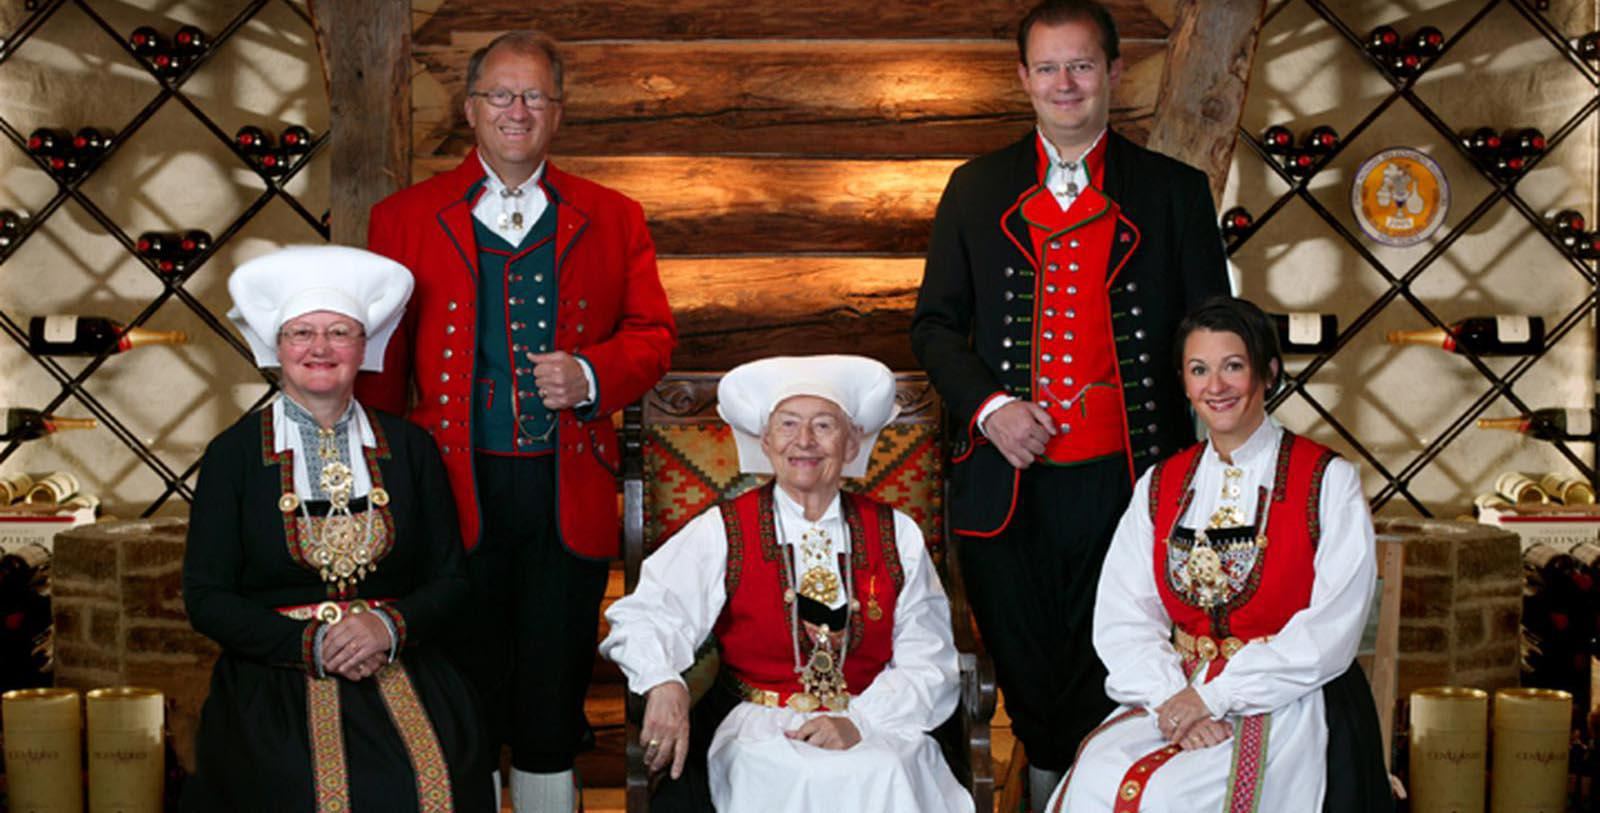 Image of Hotel Workers, Hotel Ullensvang, Lofthus, Norway, 1846, Member of Historic Hotels Worldwide, Discover